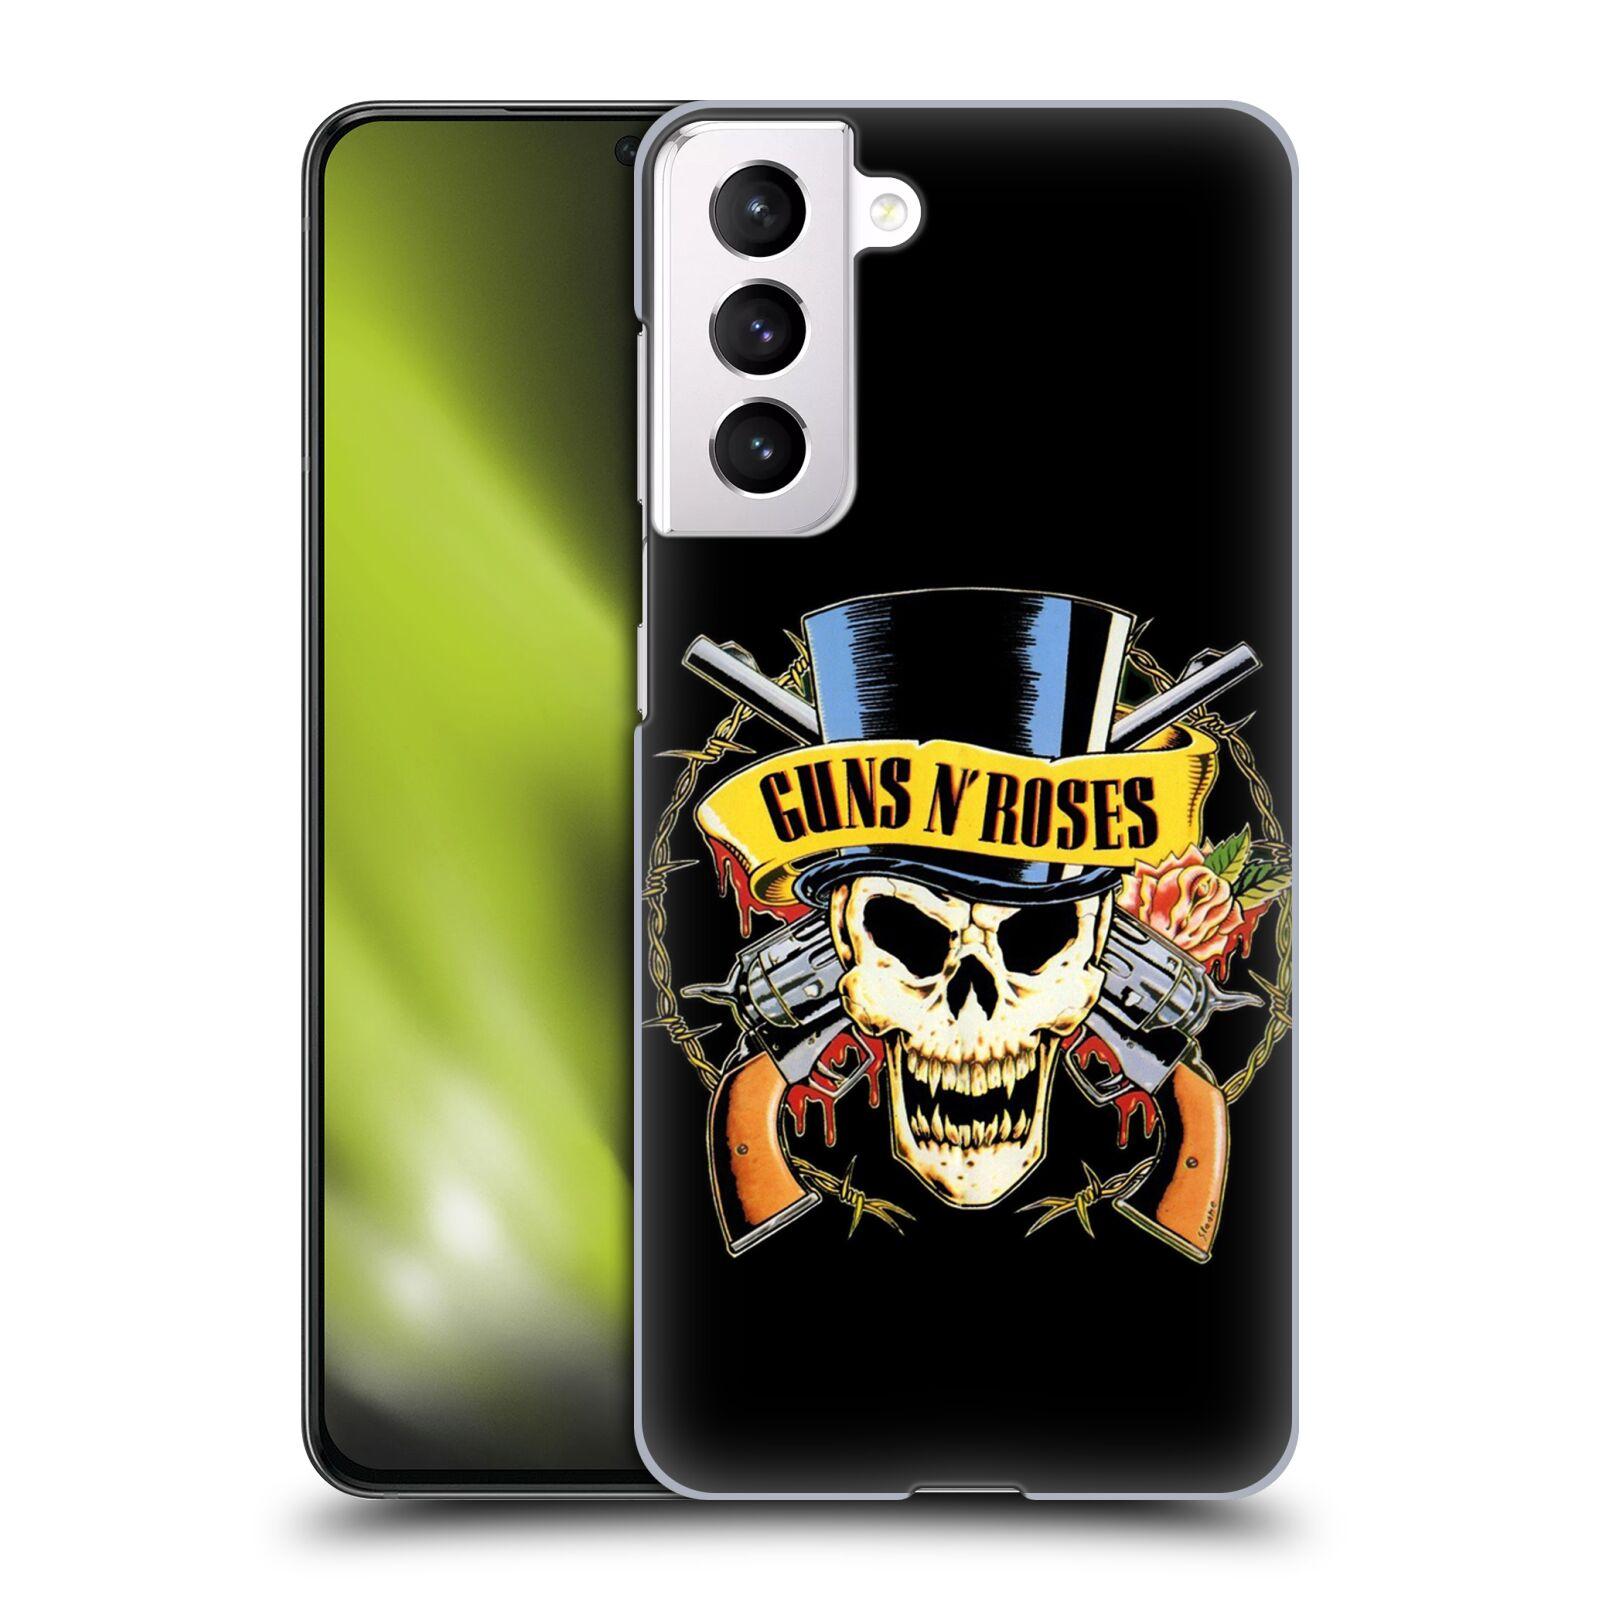 Plastové pouzdro na mobil Samsung Galaxy S21 5G - Head Case - Guns N' Roses - Lebka